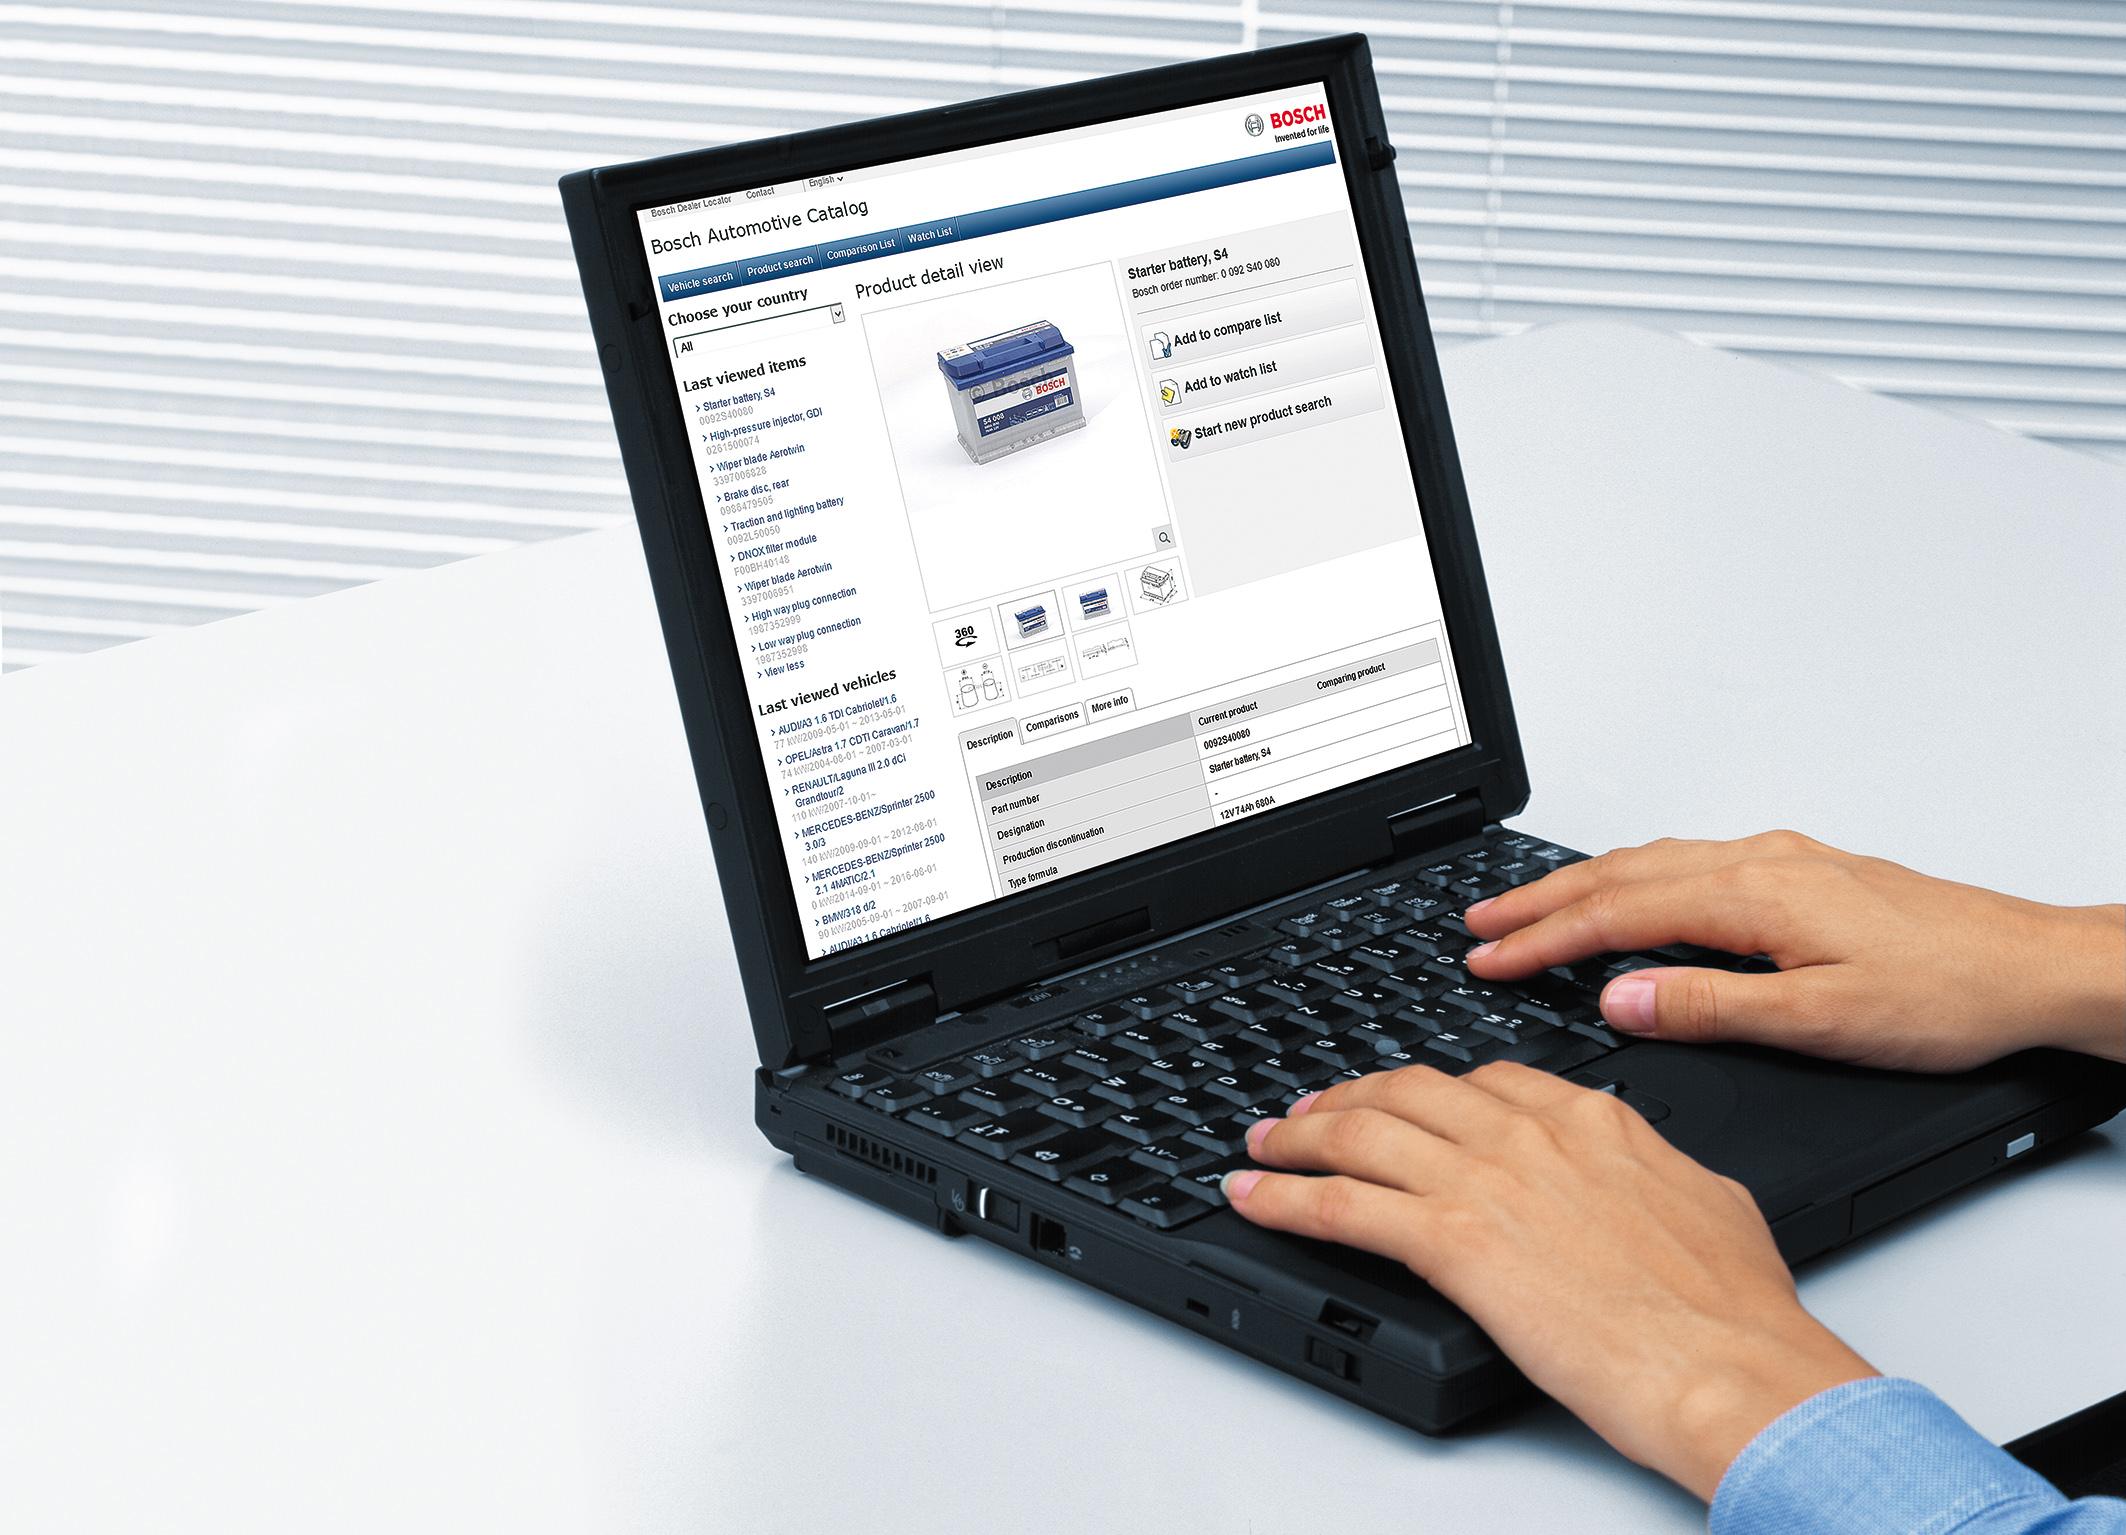 Catalogo online ricambi Bosch Automotive